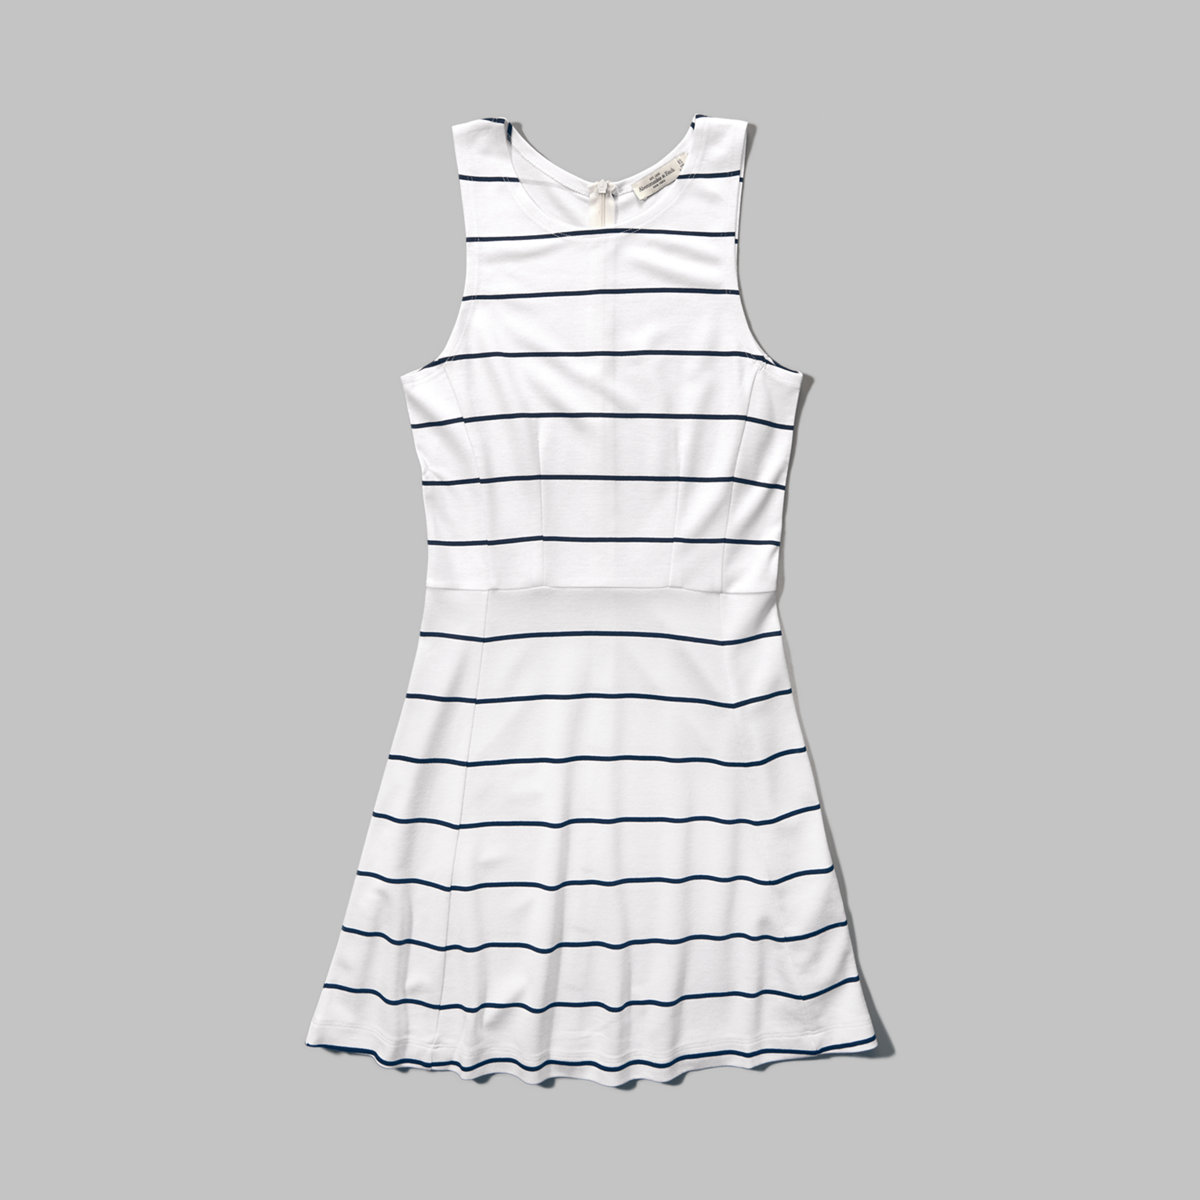 Nautical Striped Skater Dress